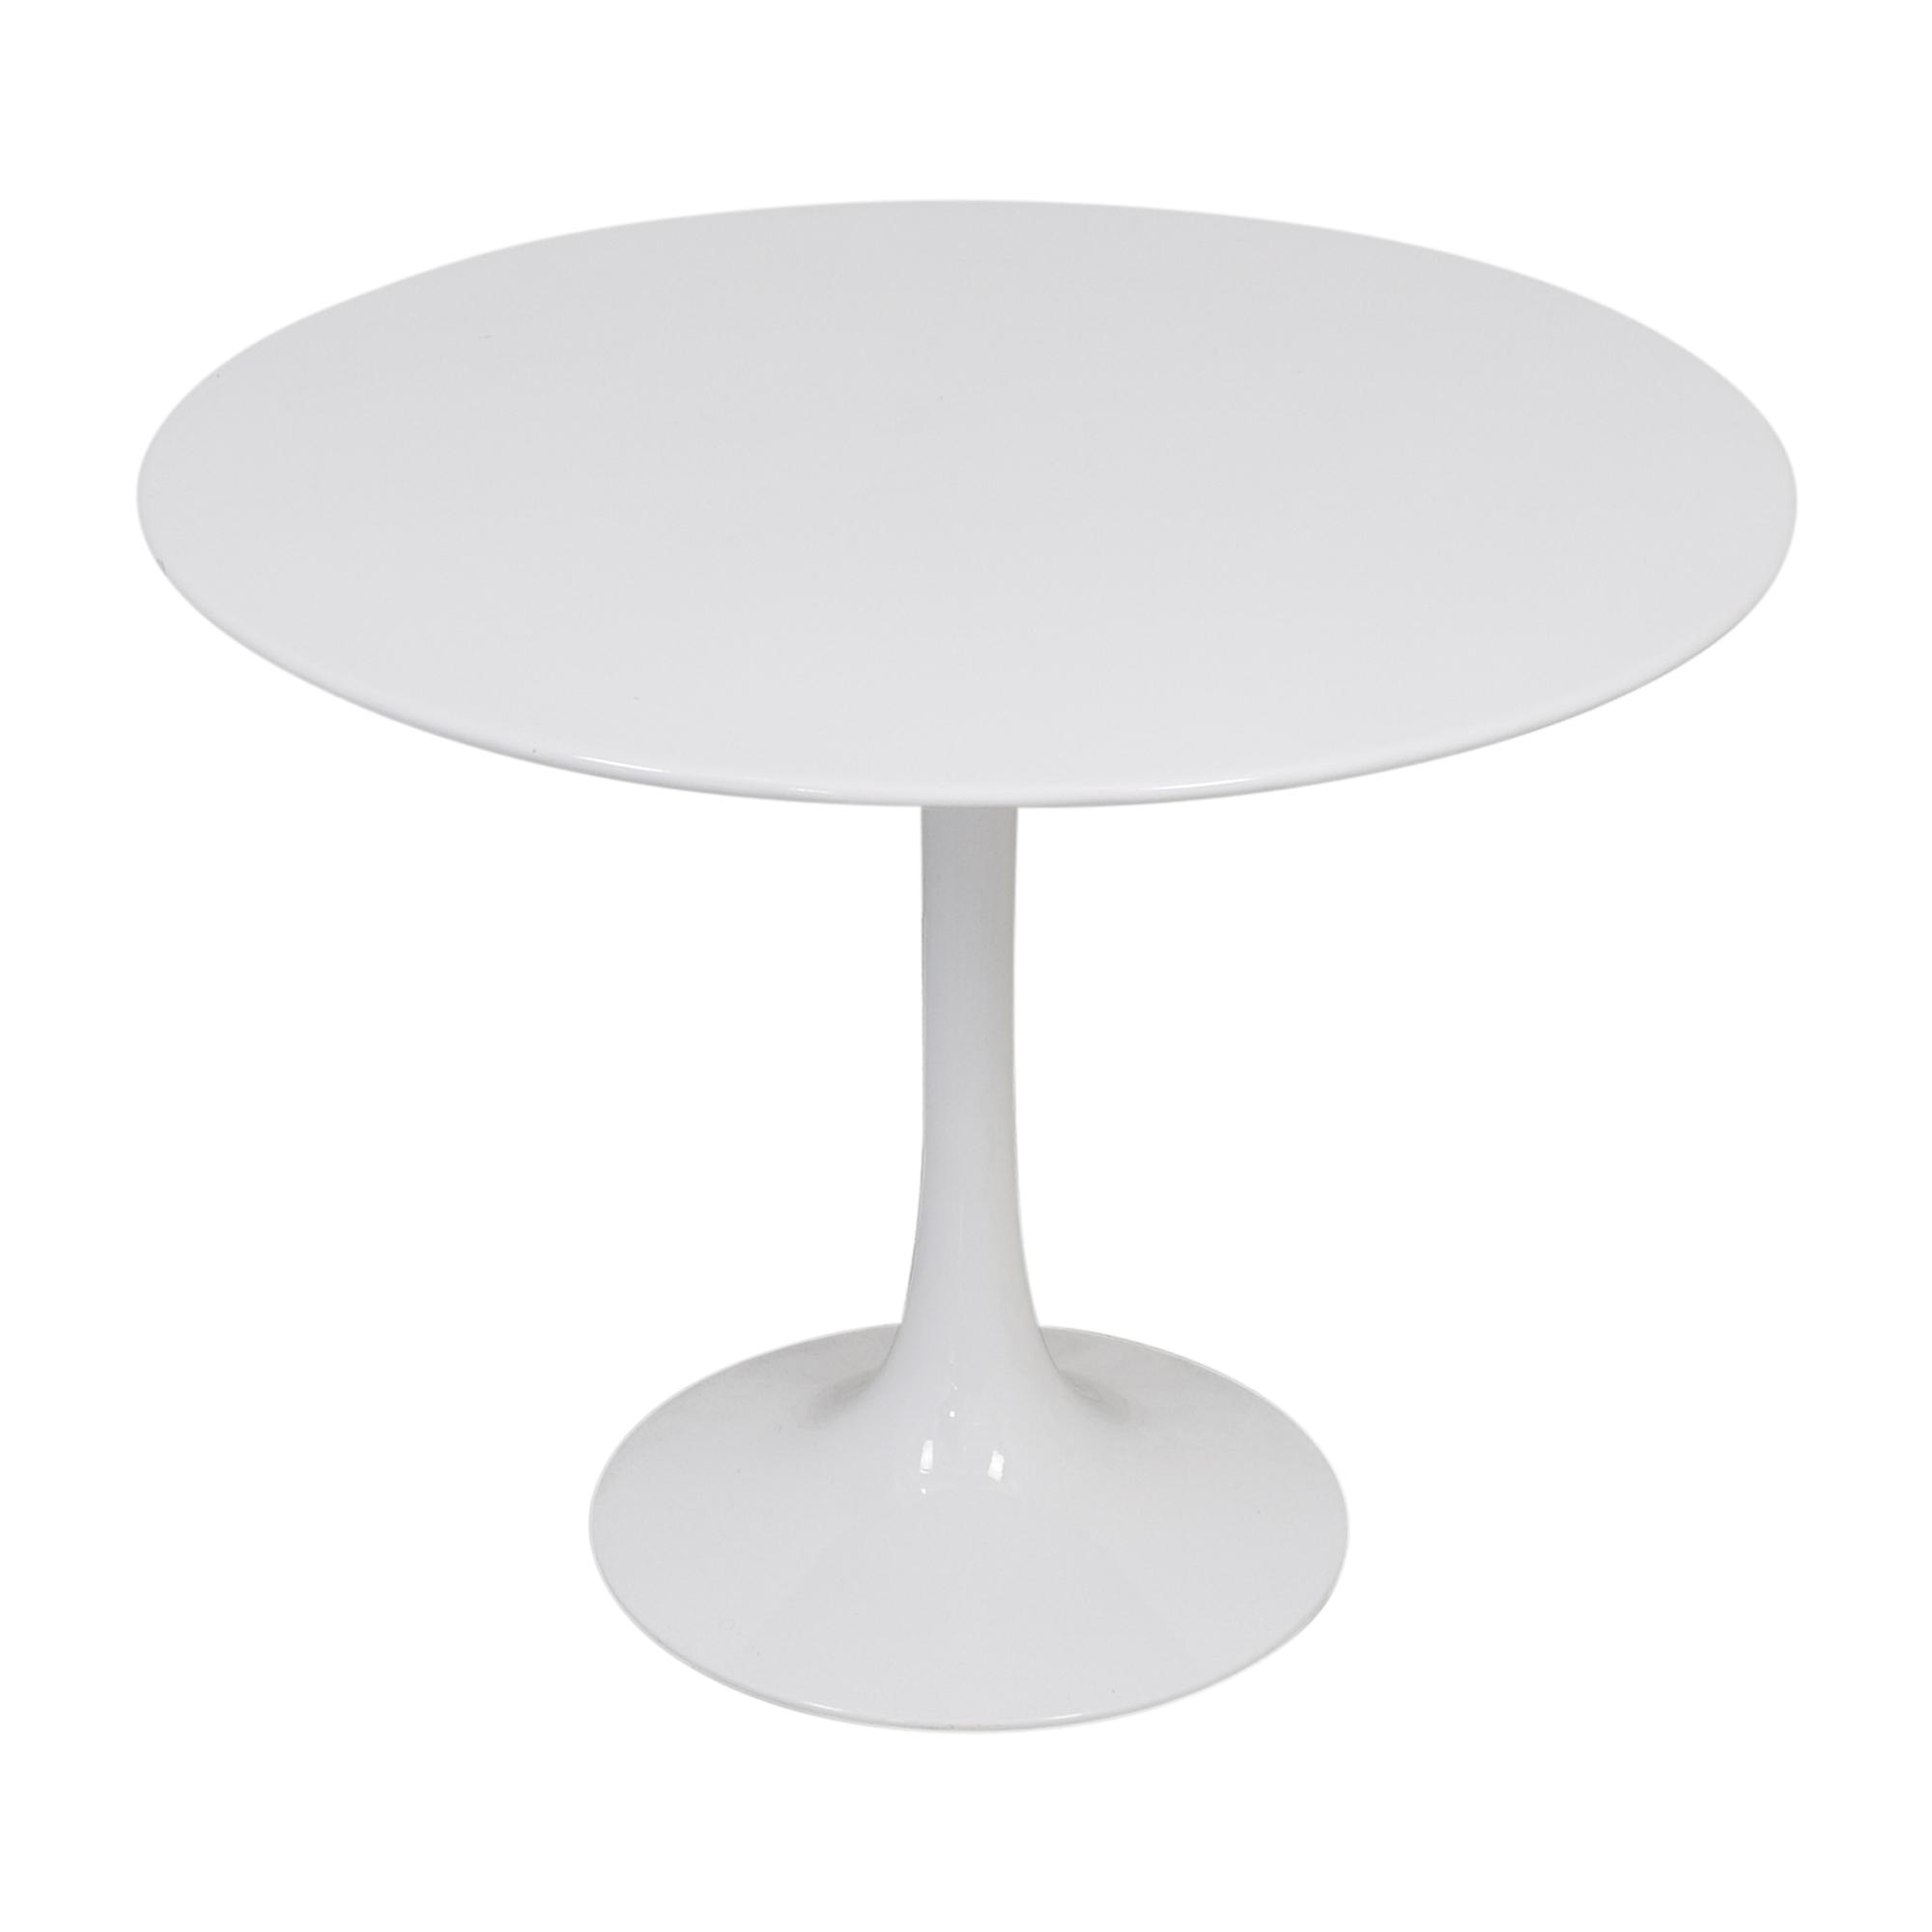 Edgemod Daisy Dining Table Edgemod